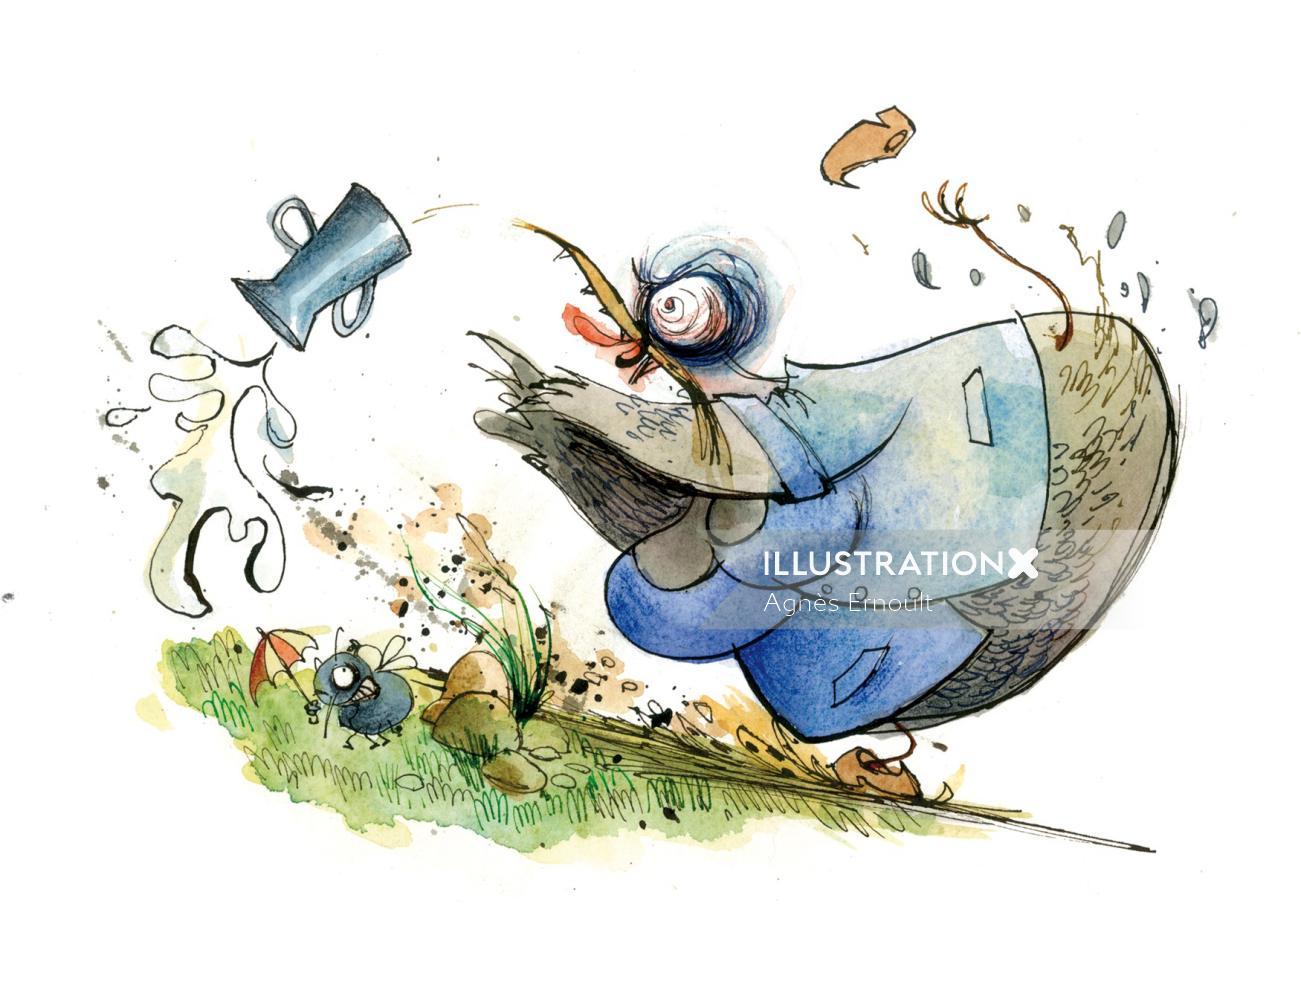 Comic illustration of pig